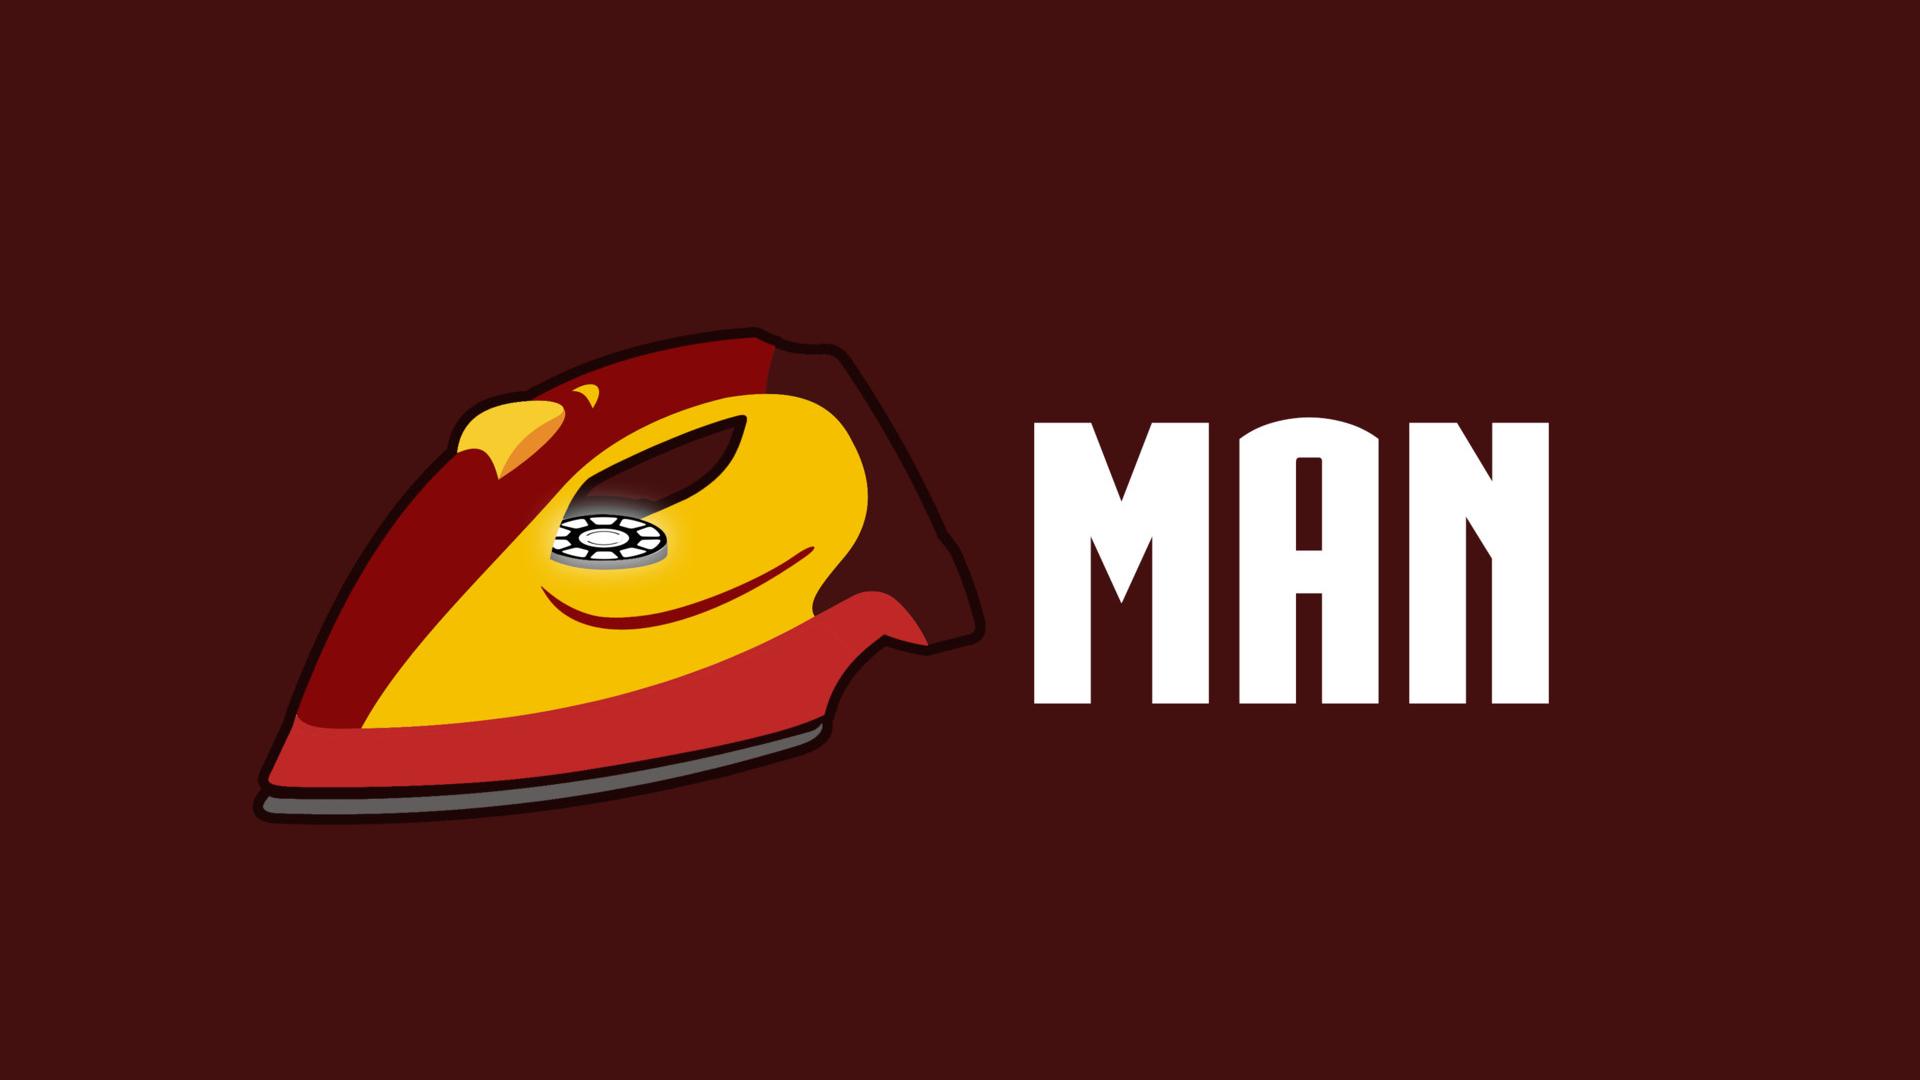 1920x1080 Iron Man Funny Minimalism Laptop Full Hd 1080p Hd